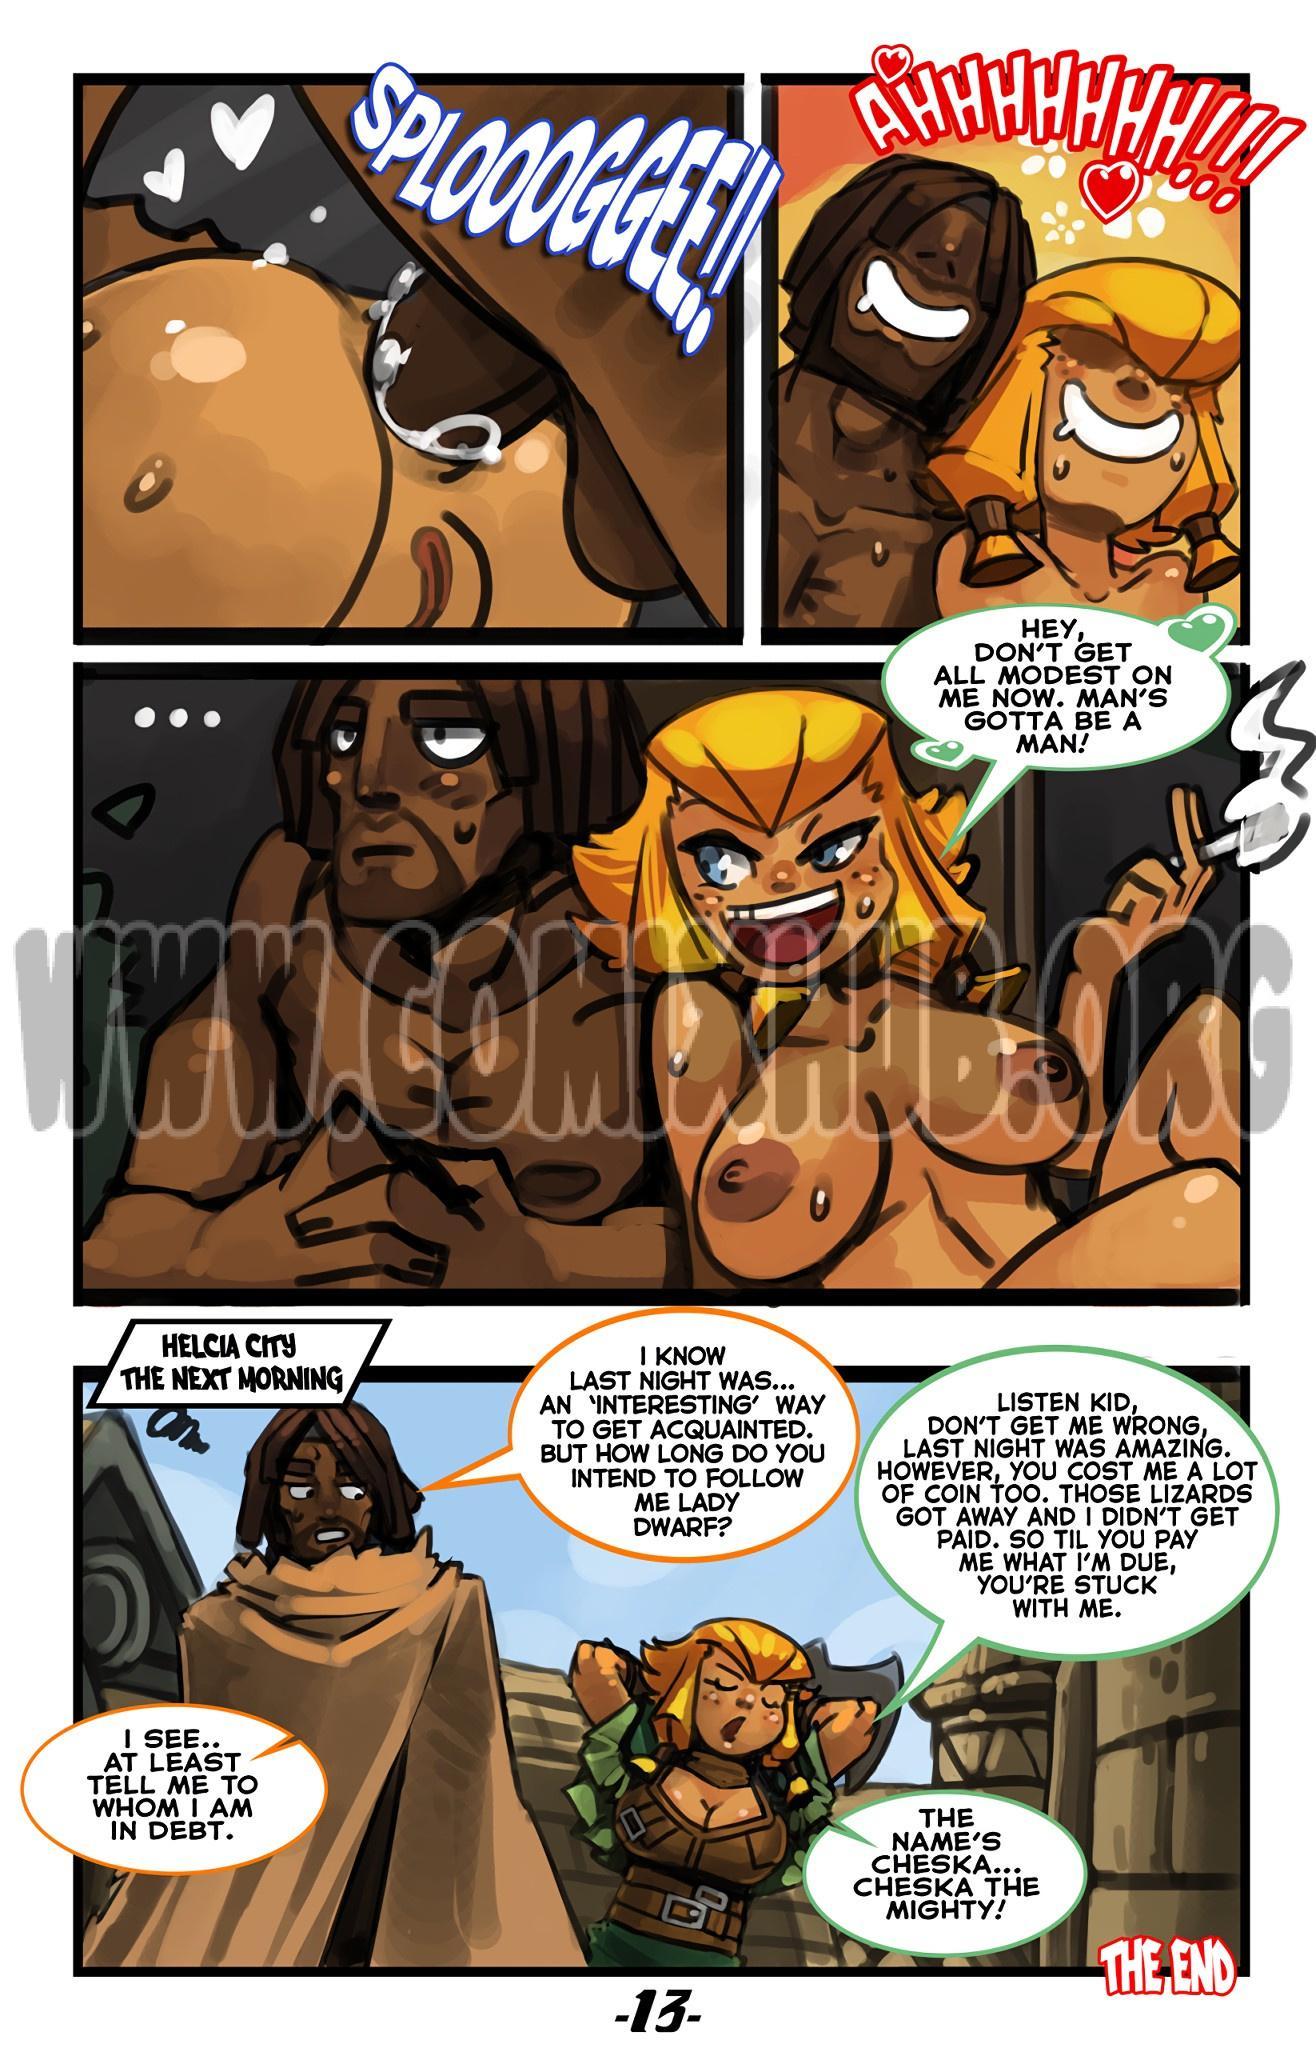 Cheska the Mighty porn comics Oral sex, Anal Sex, Big Tits, Blowjob, Creampie, Deepthroat, Straight, Titfuck